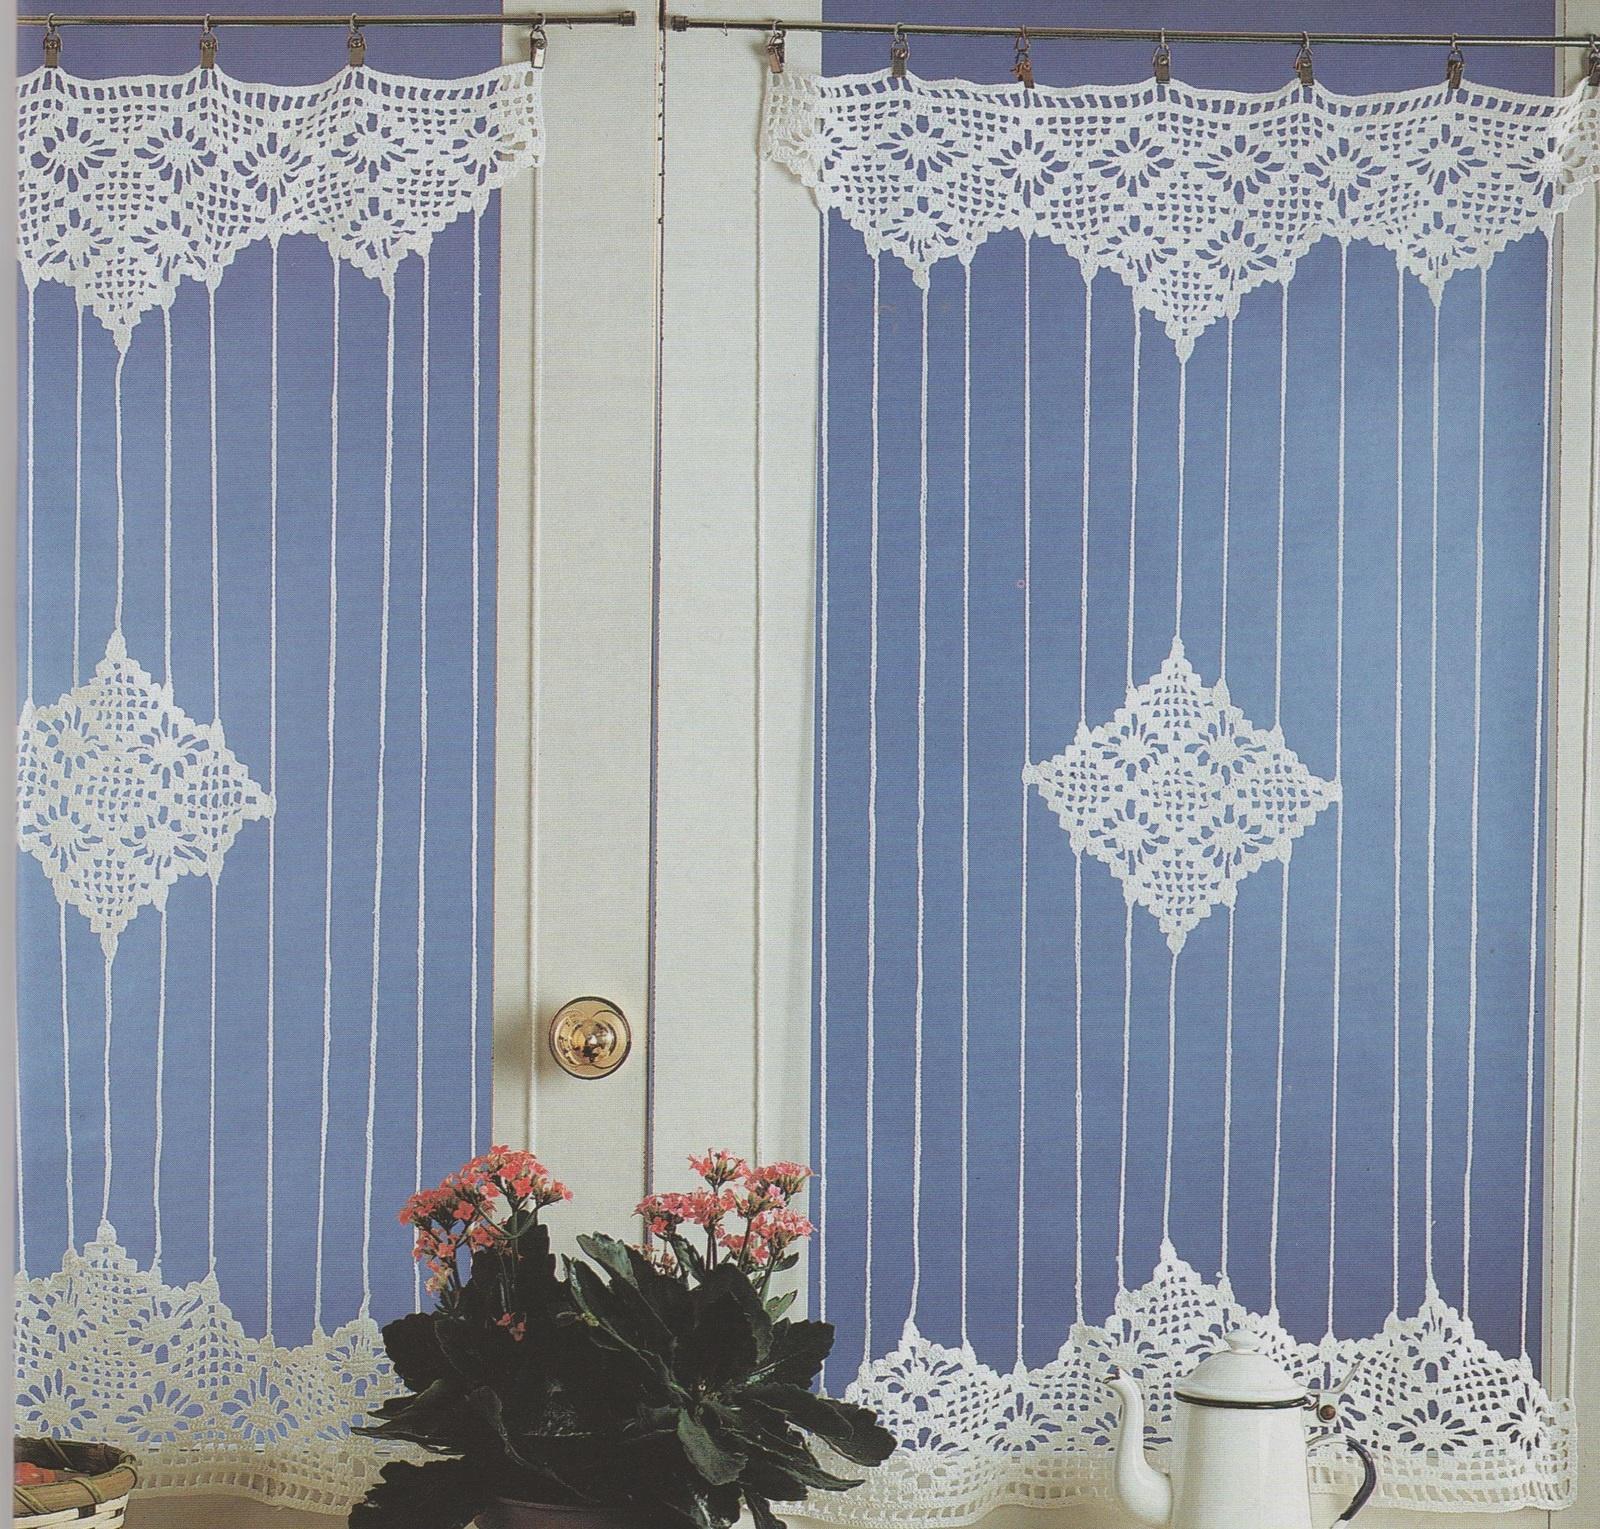 mes favoris tricot crochet. Black Bedroom Furniture Sets. Home Design Ideas